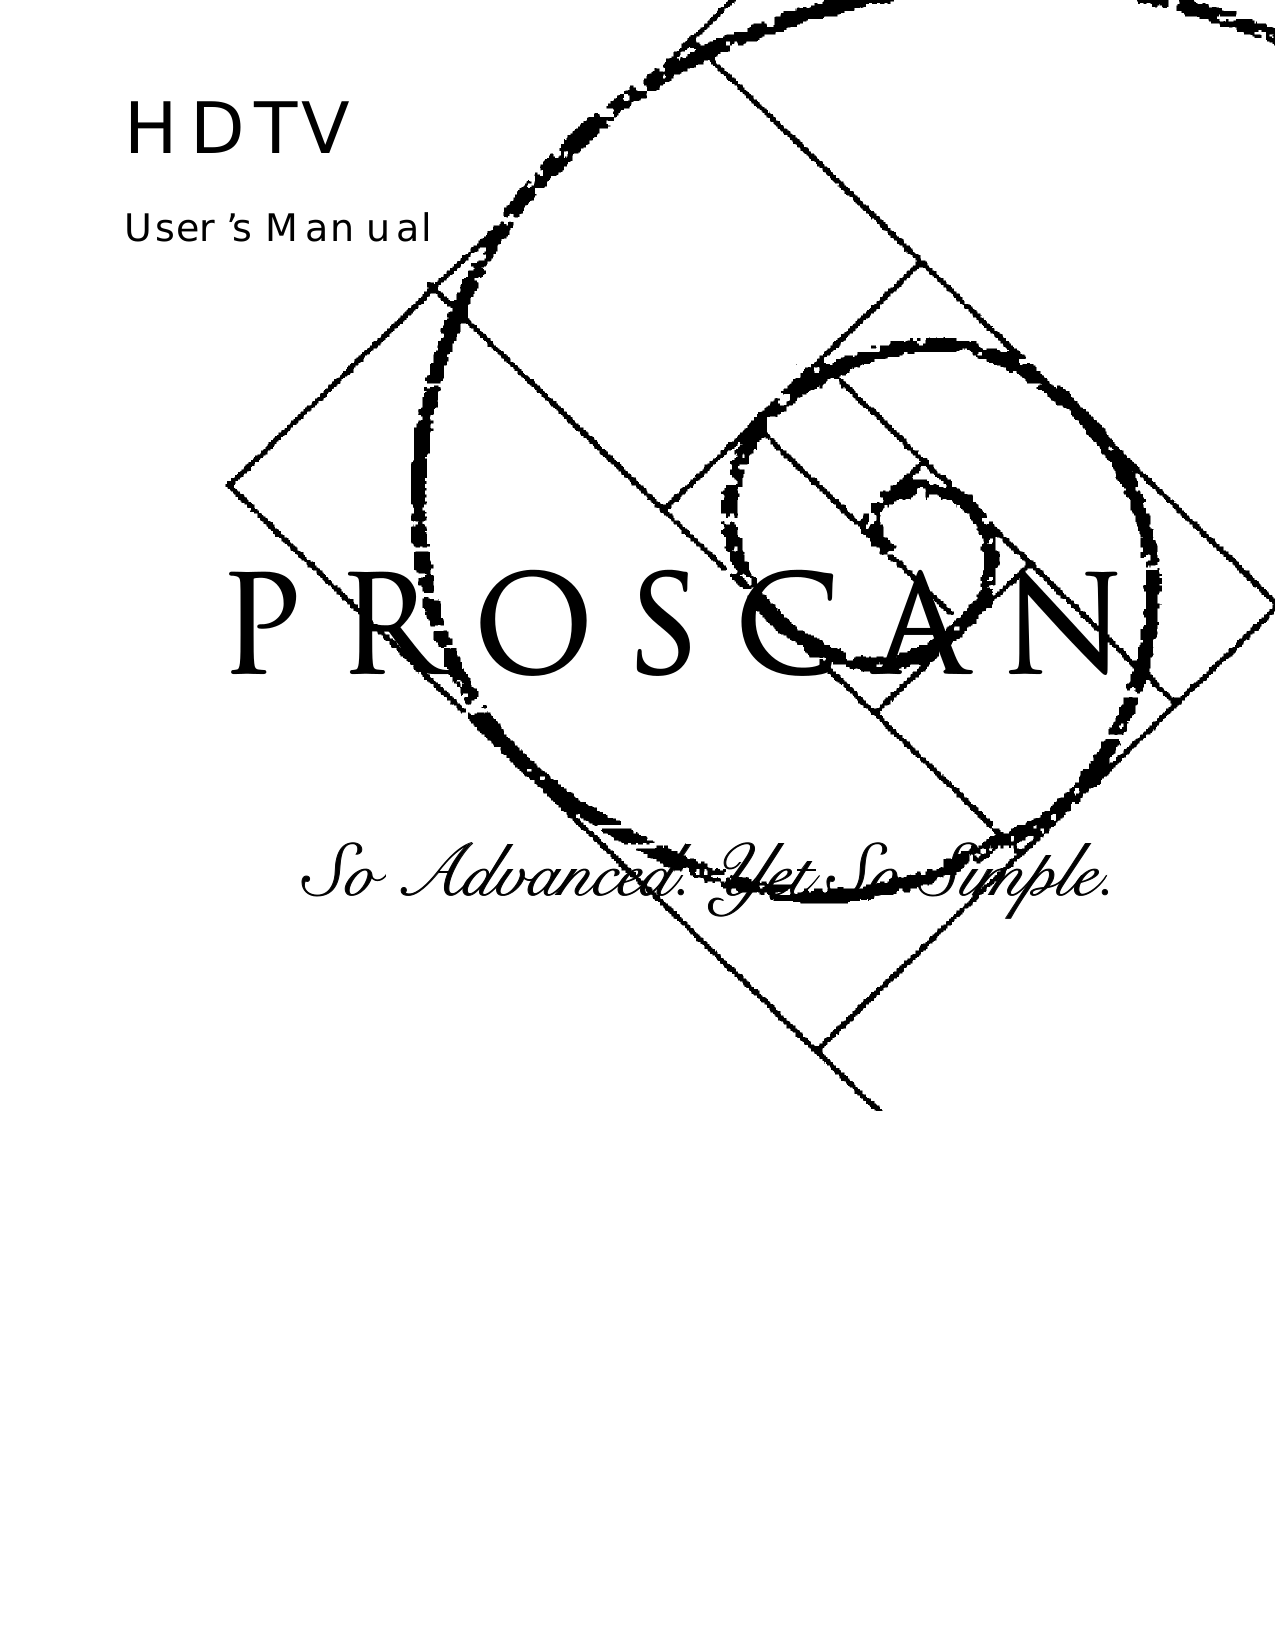 proscan manuals tv